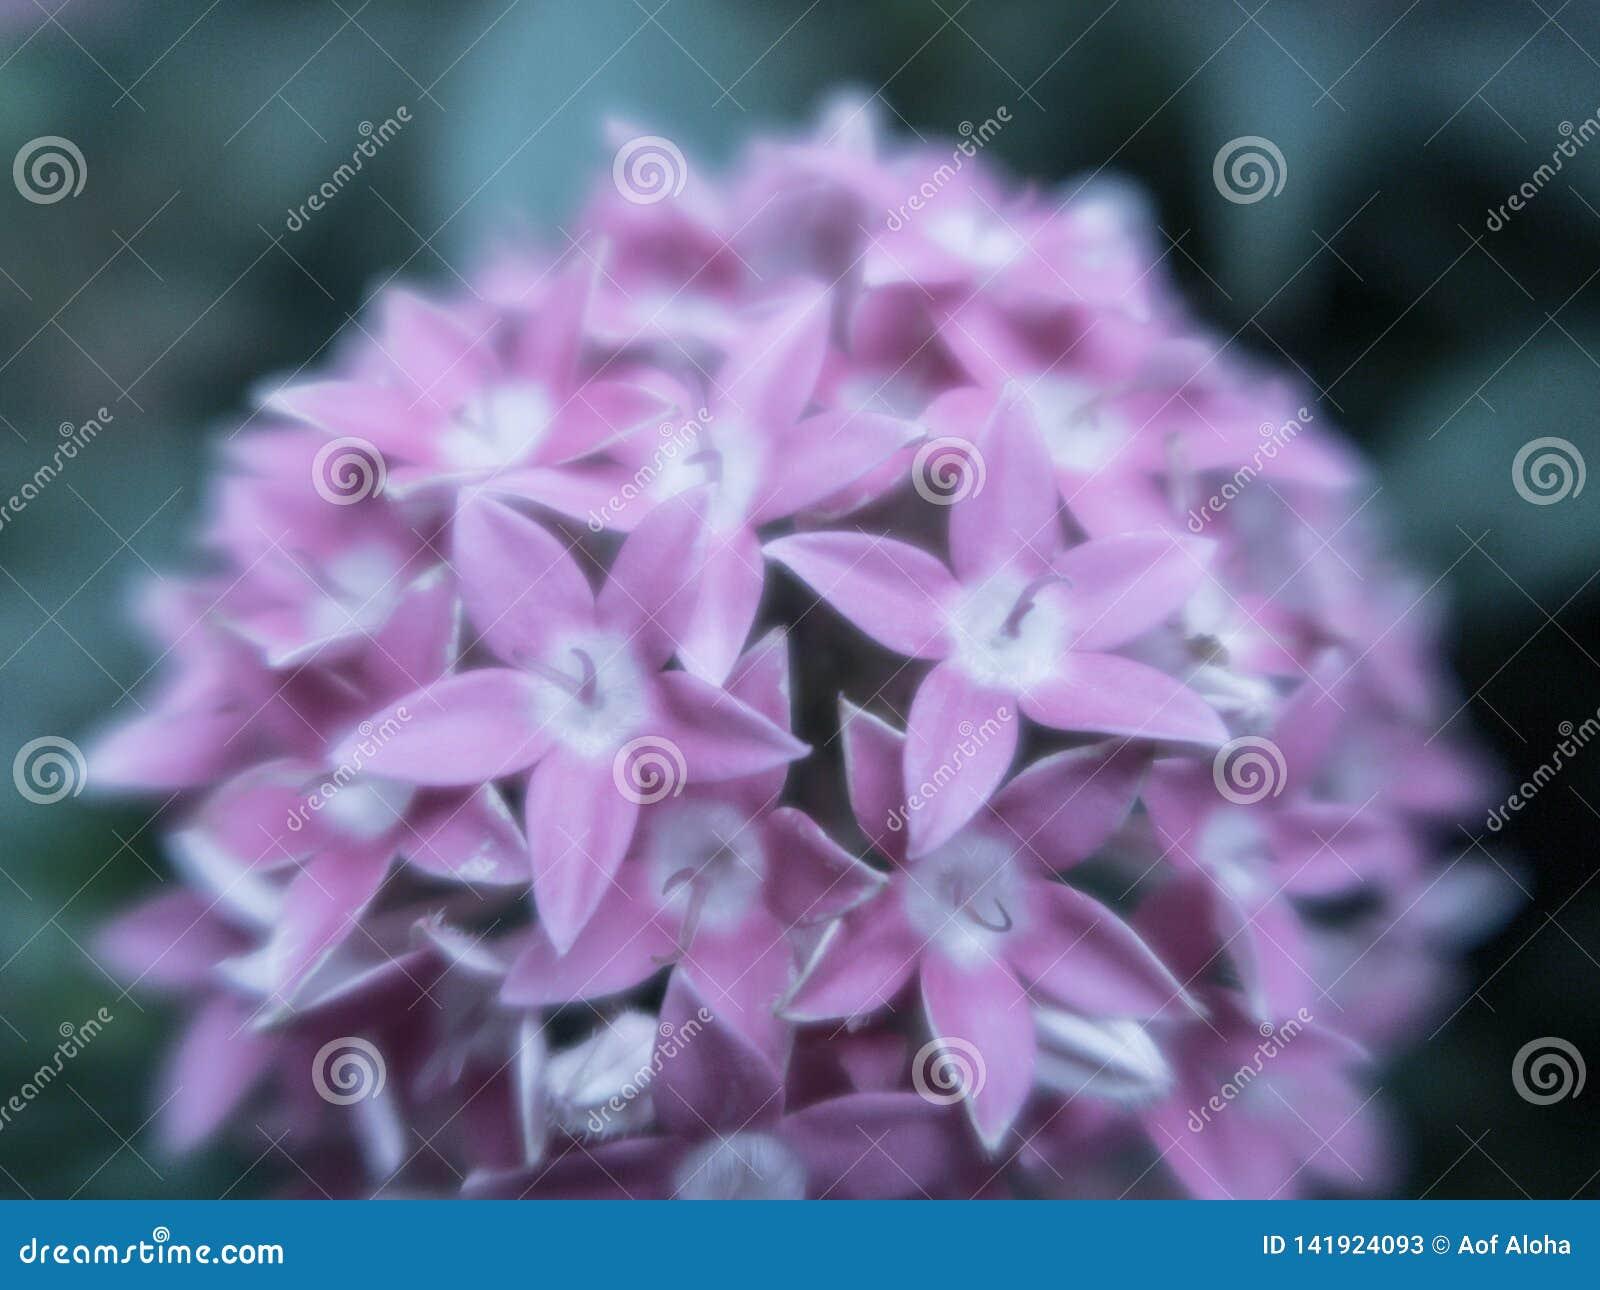 Blurred close up Lucky Star Deep Pink flower or Cornus sanguinea in the garden.